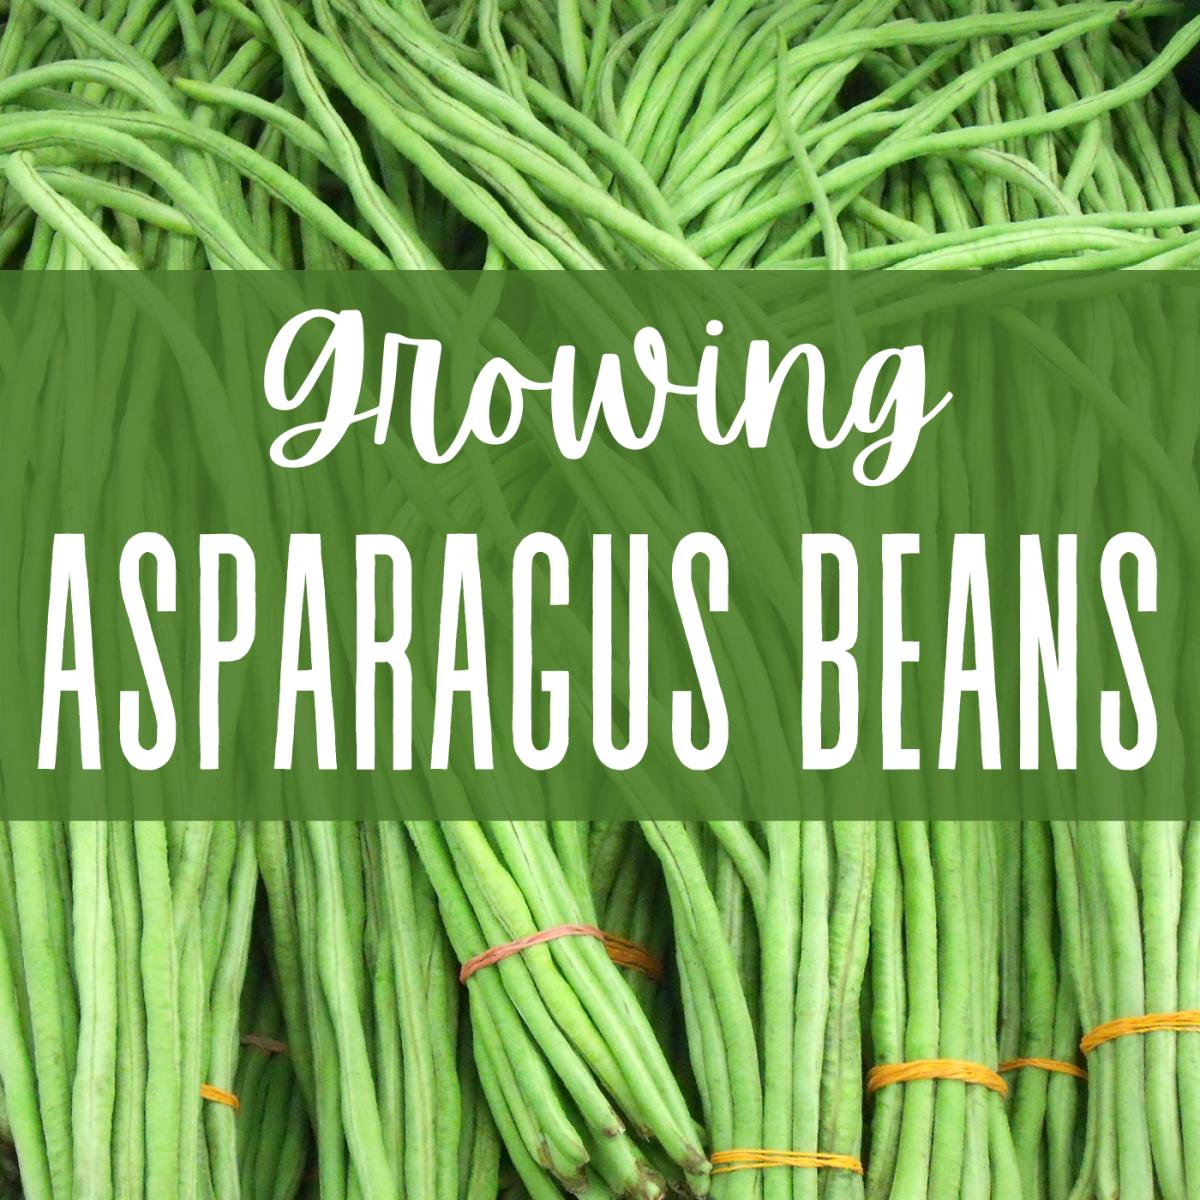 Learn how to plant, grow, and serve asparagus beans.